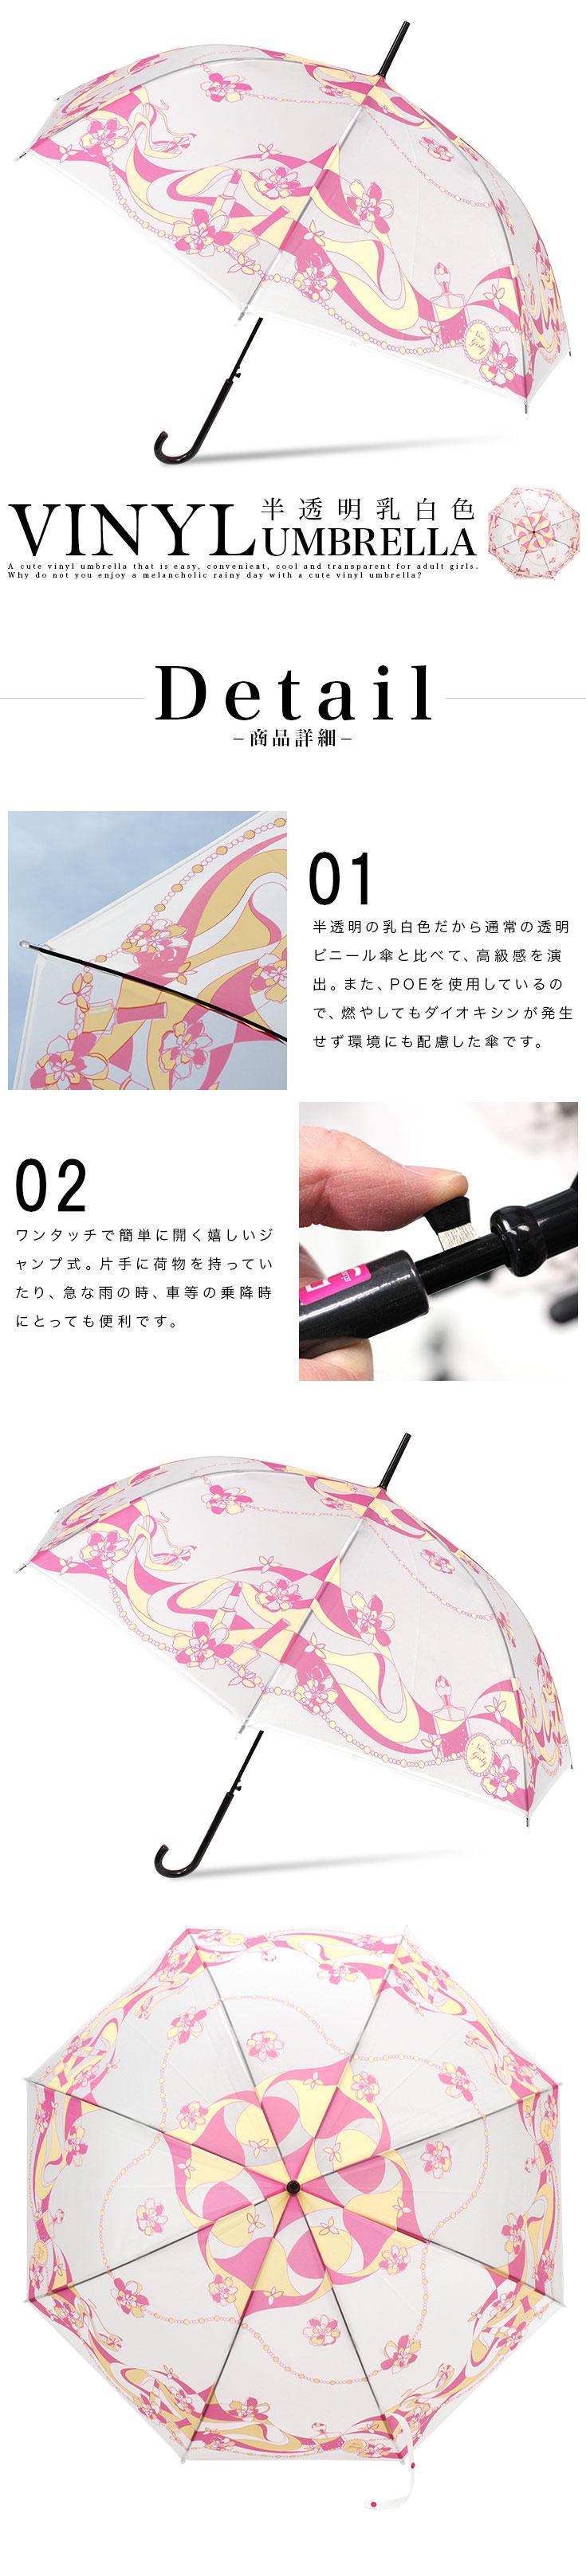 SIZE58cmネコ柄ビニール傘